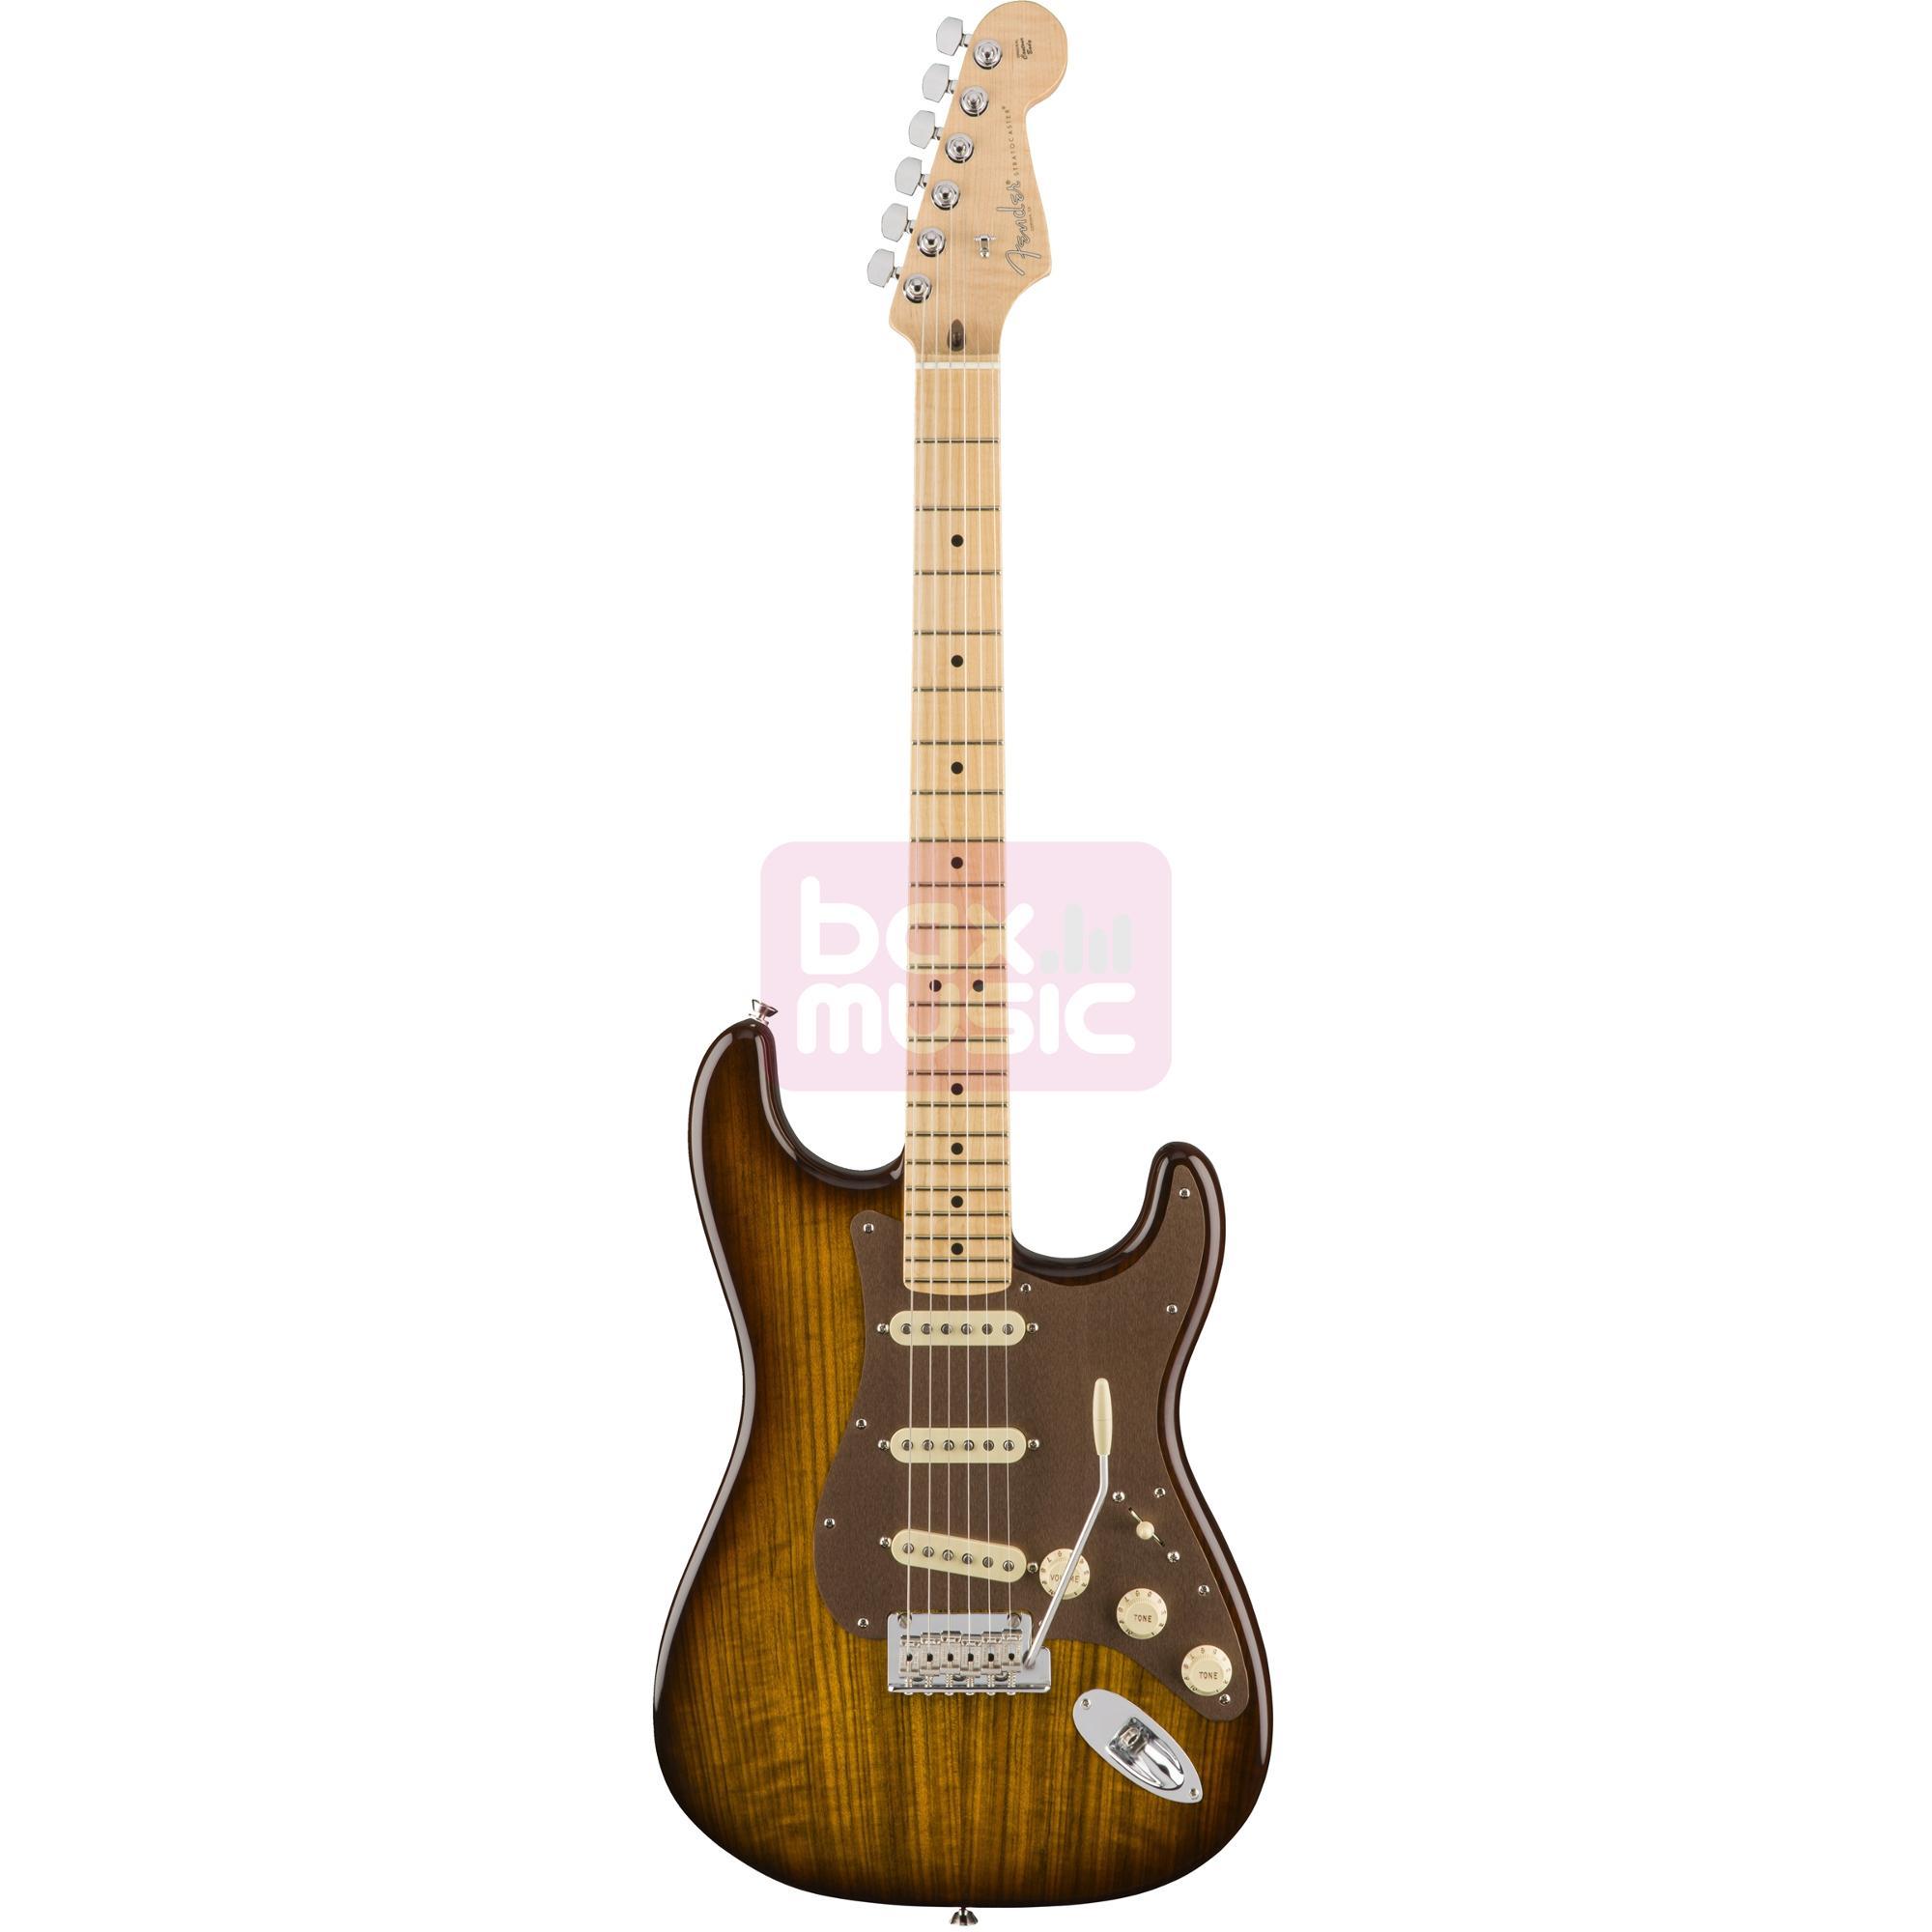 Fender 2017 Limited Edition Shedua Top Stratocaster Natural